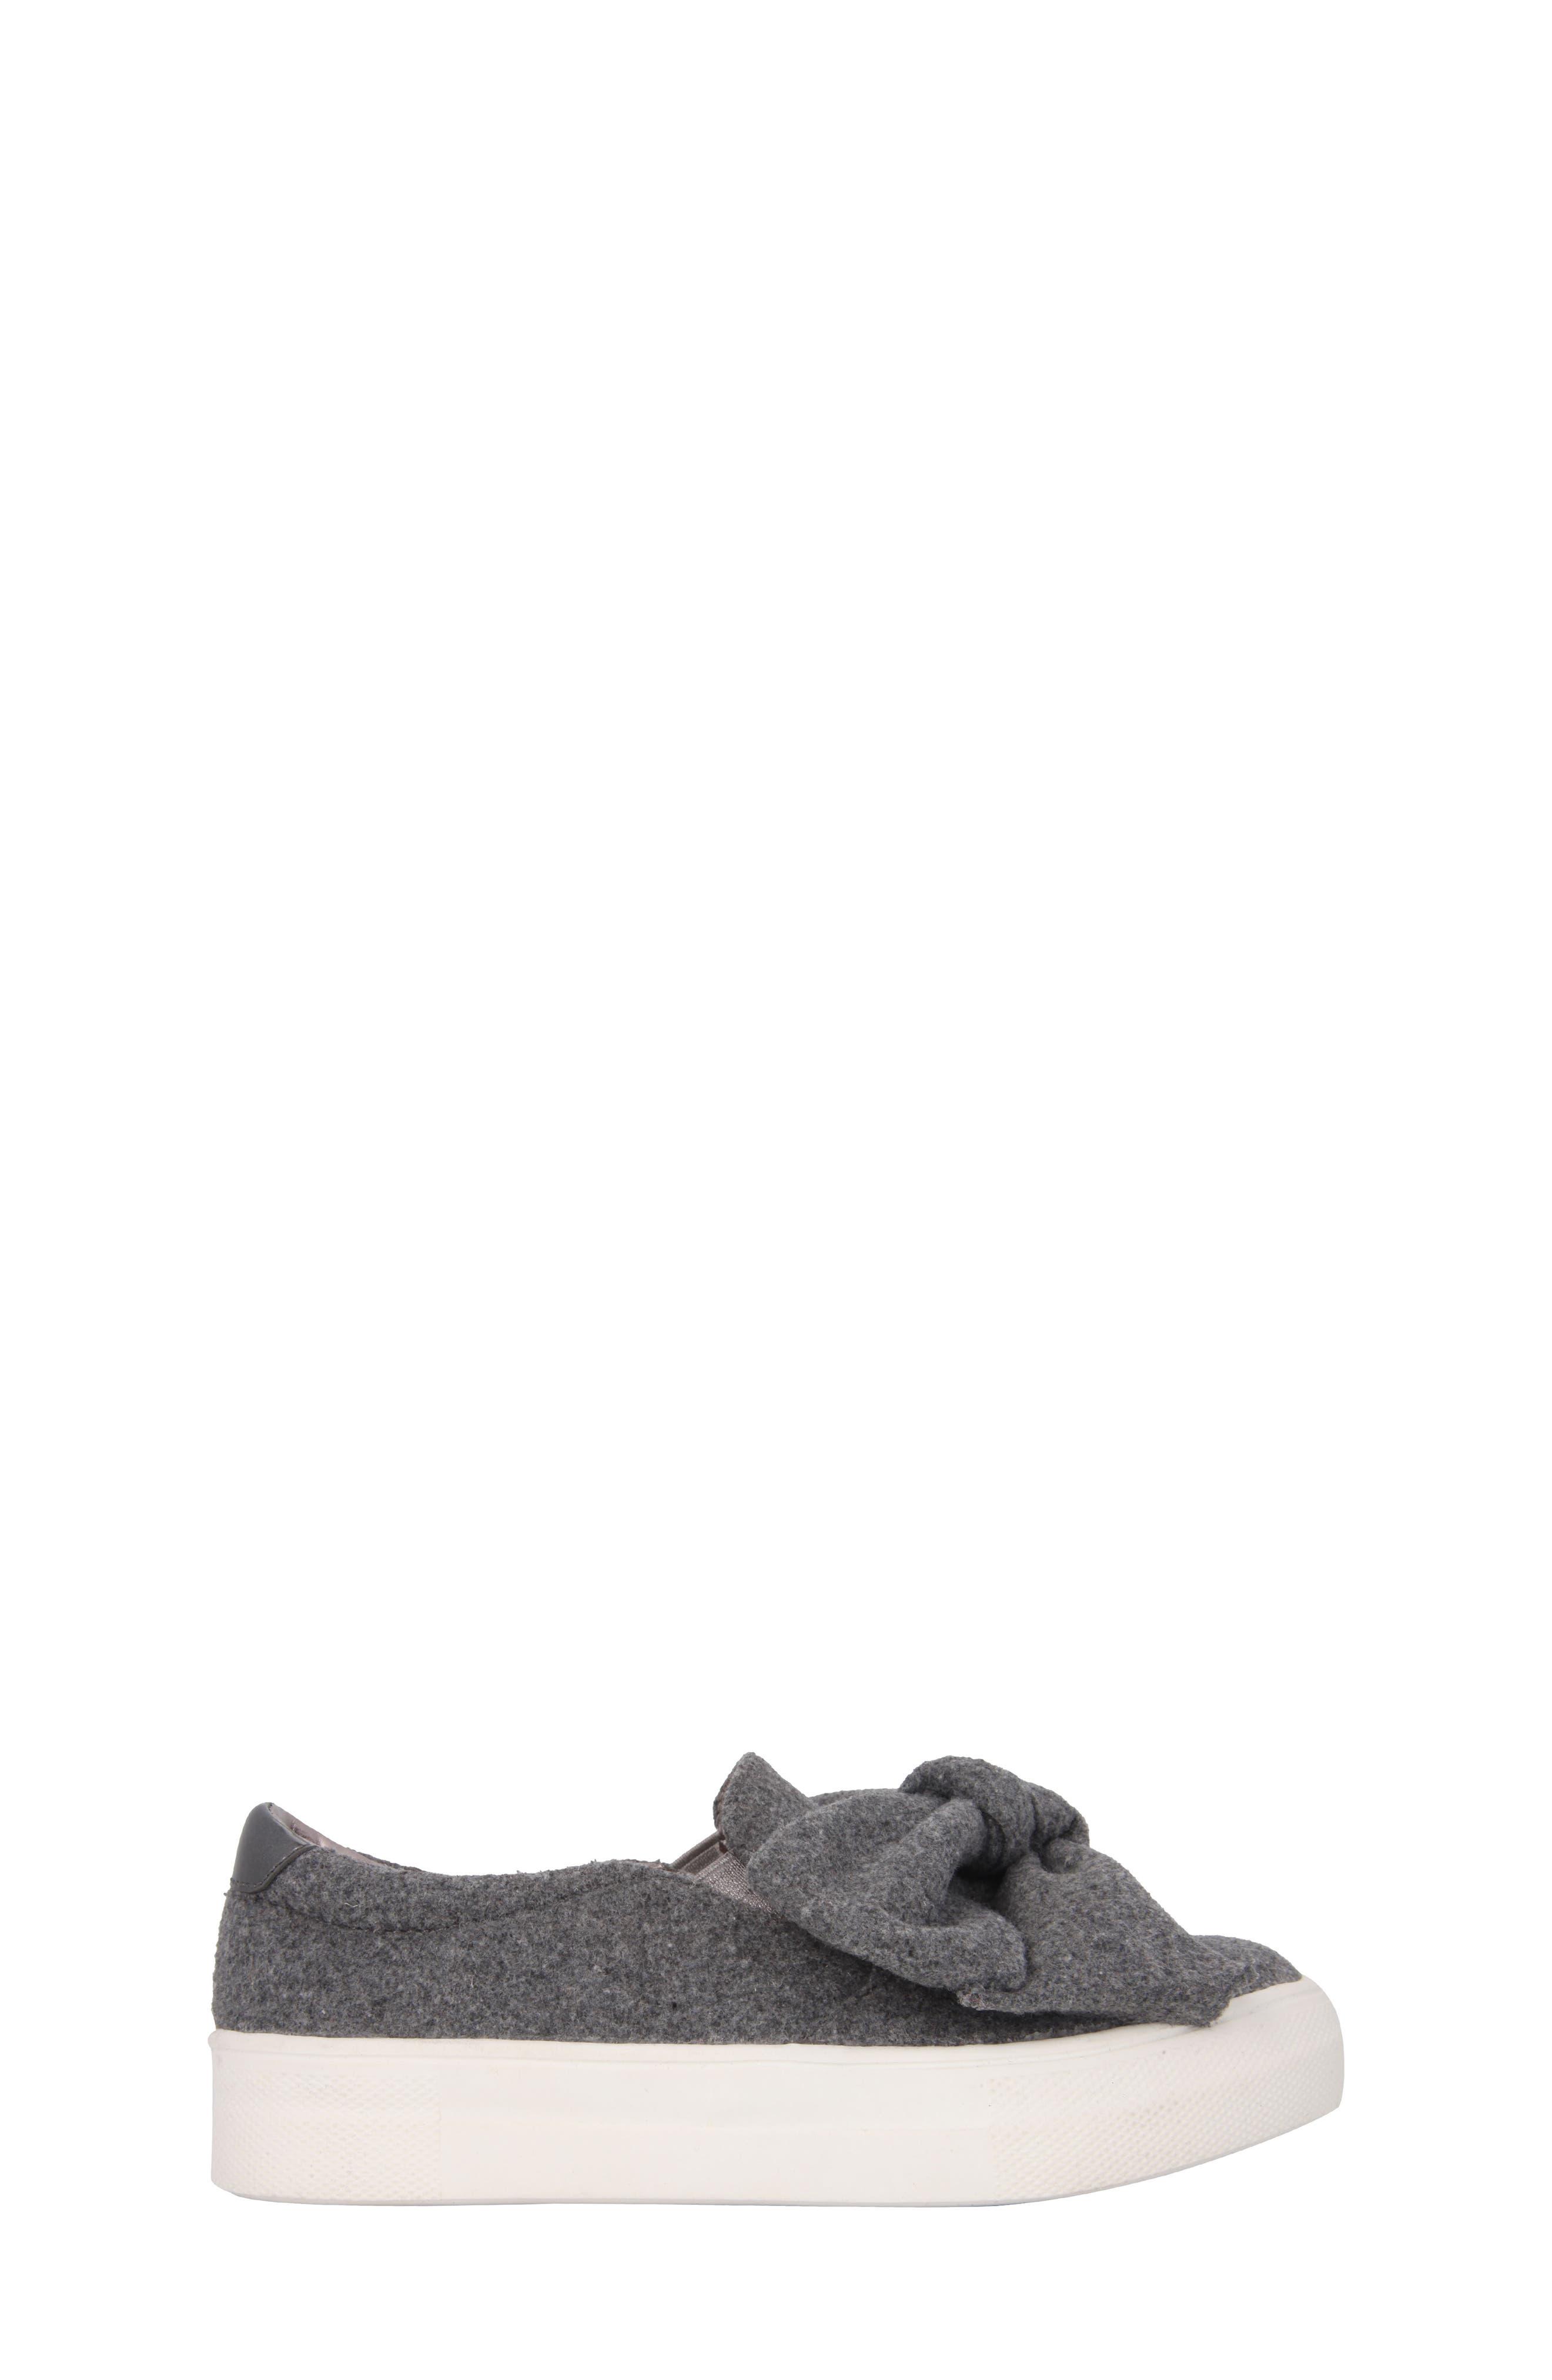 Vaneza Slip-On Bow Sneaker,                             Alternate thumbnail 3, color,                             Grey Flannel